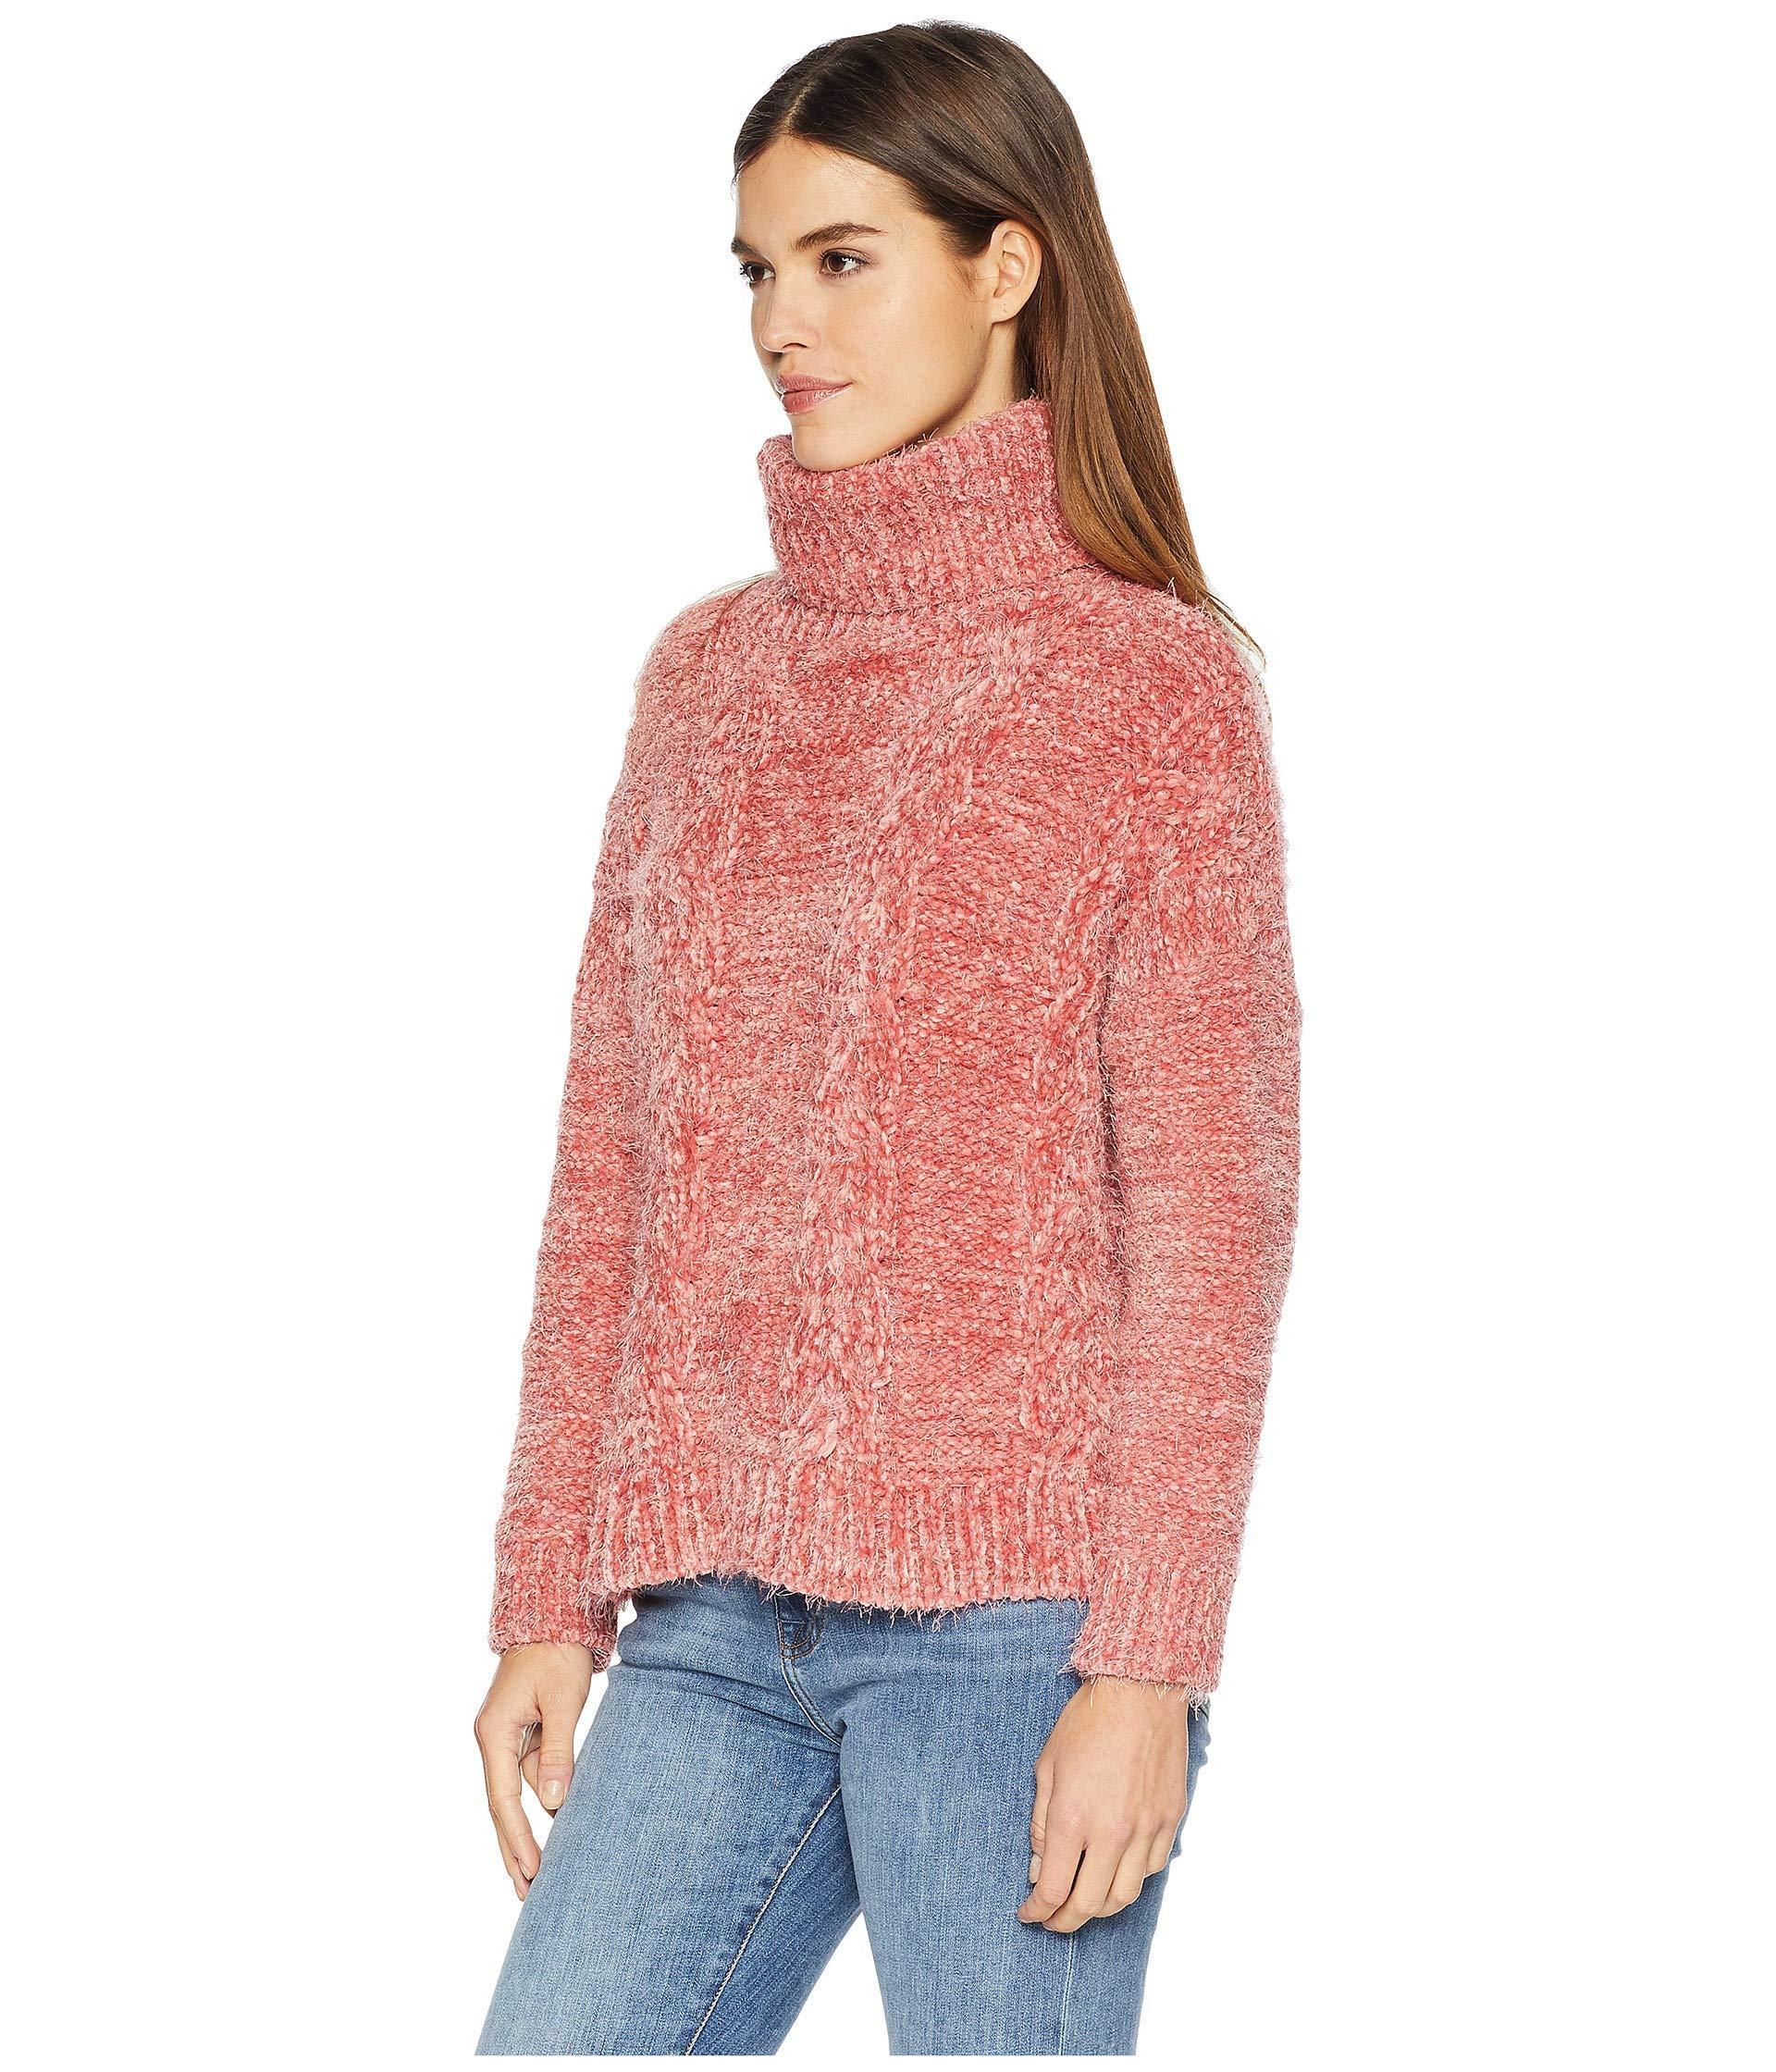 daac4b14bda Jack BB Dakota Eyelash Kisses Chenille Cable Knit Sweater in Pink - Save  10% - Lyst